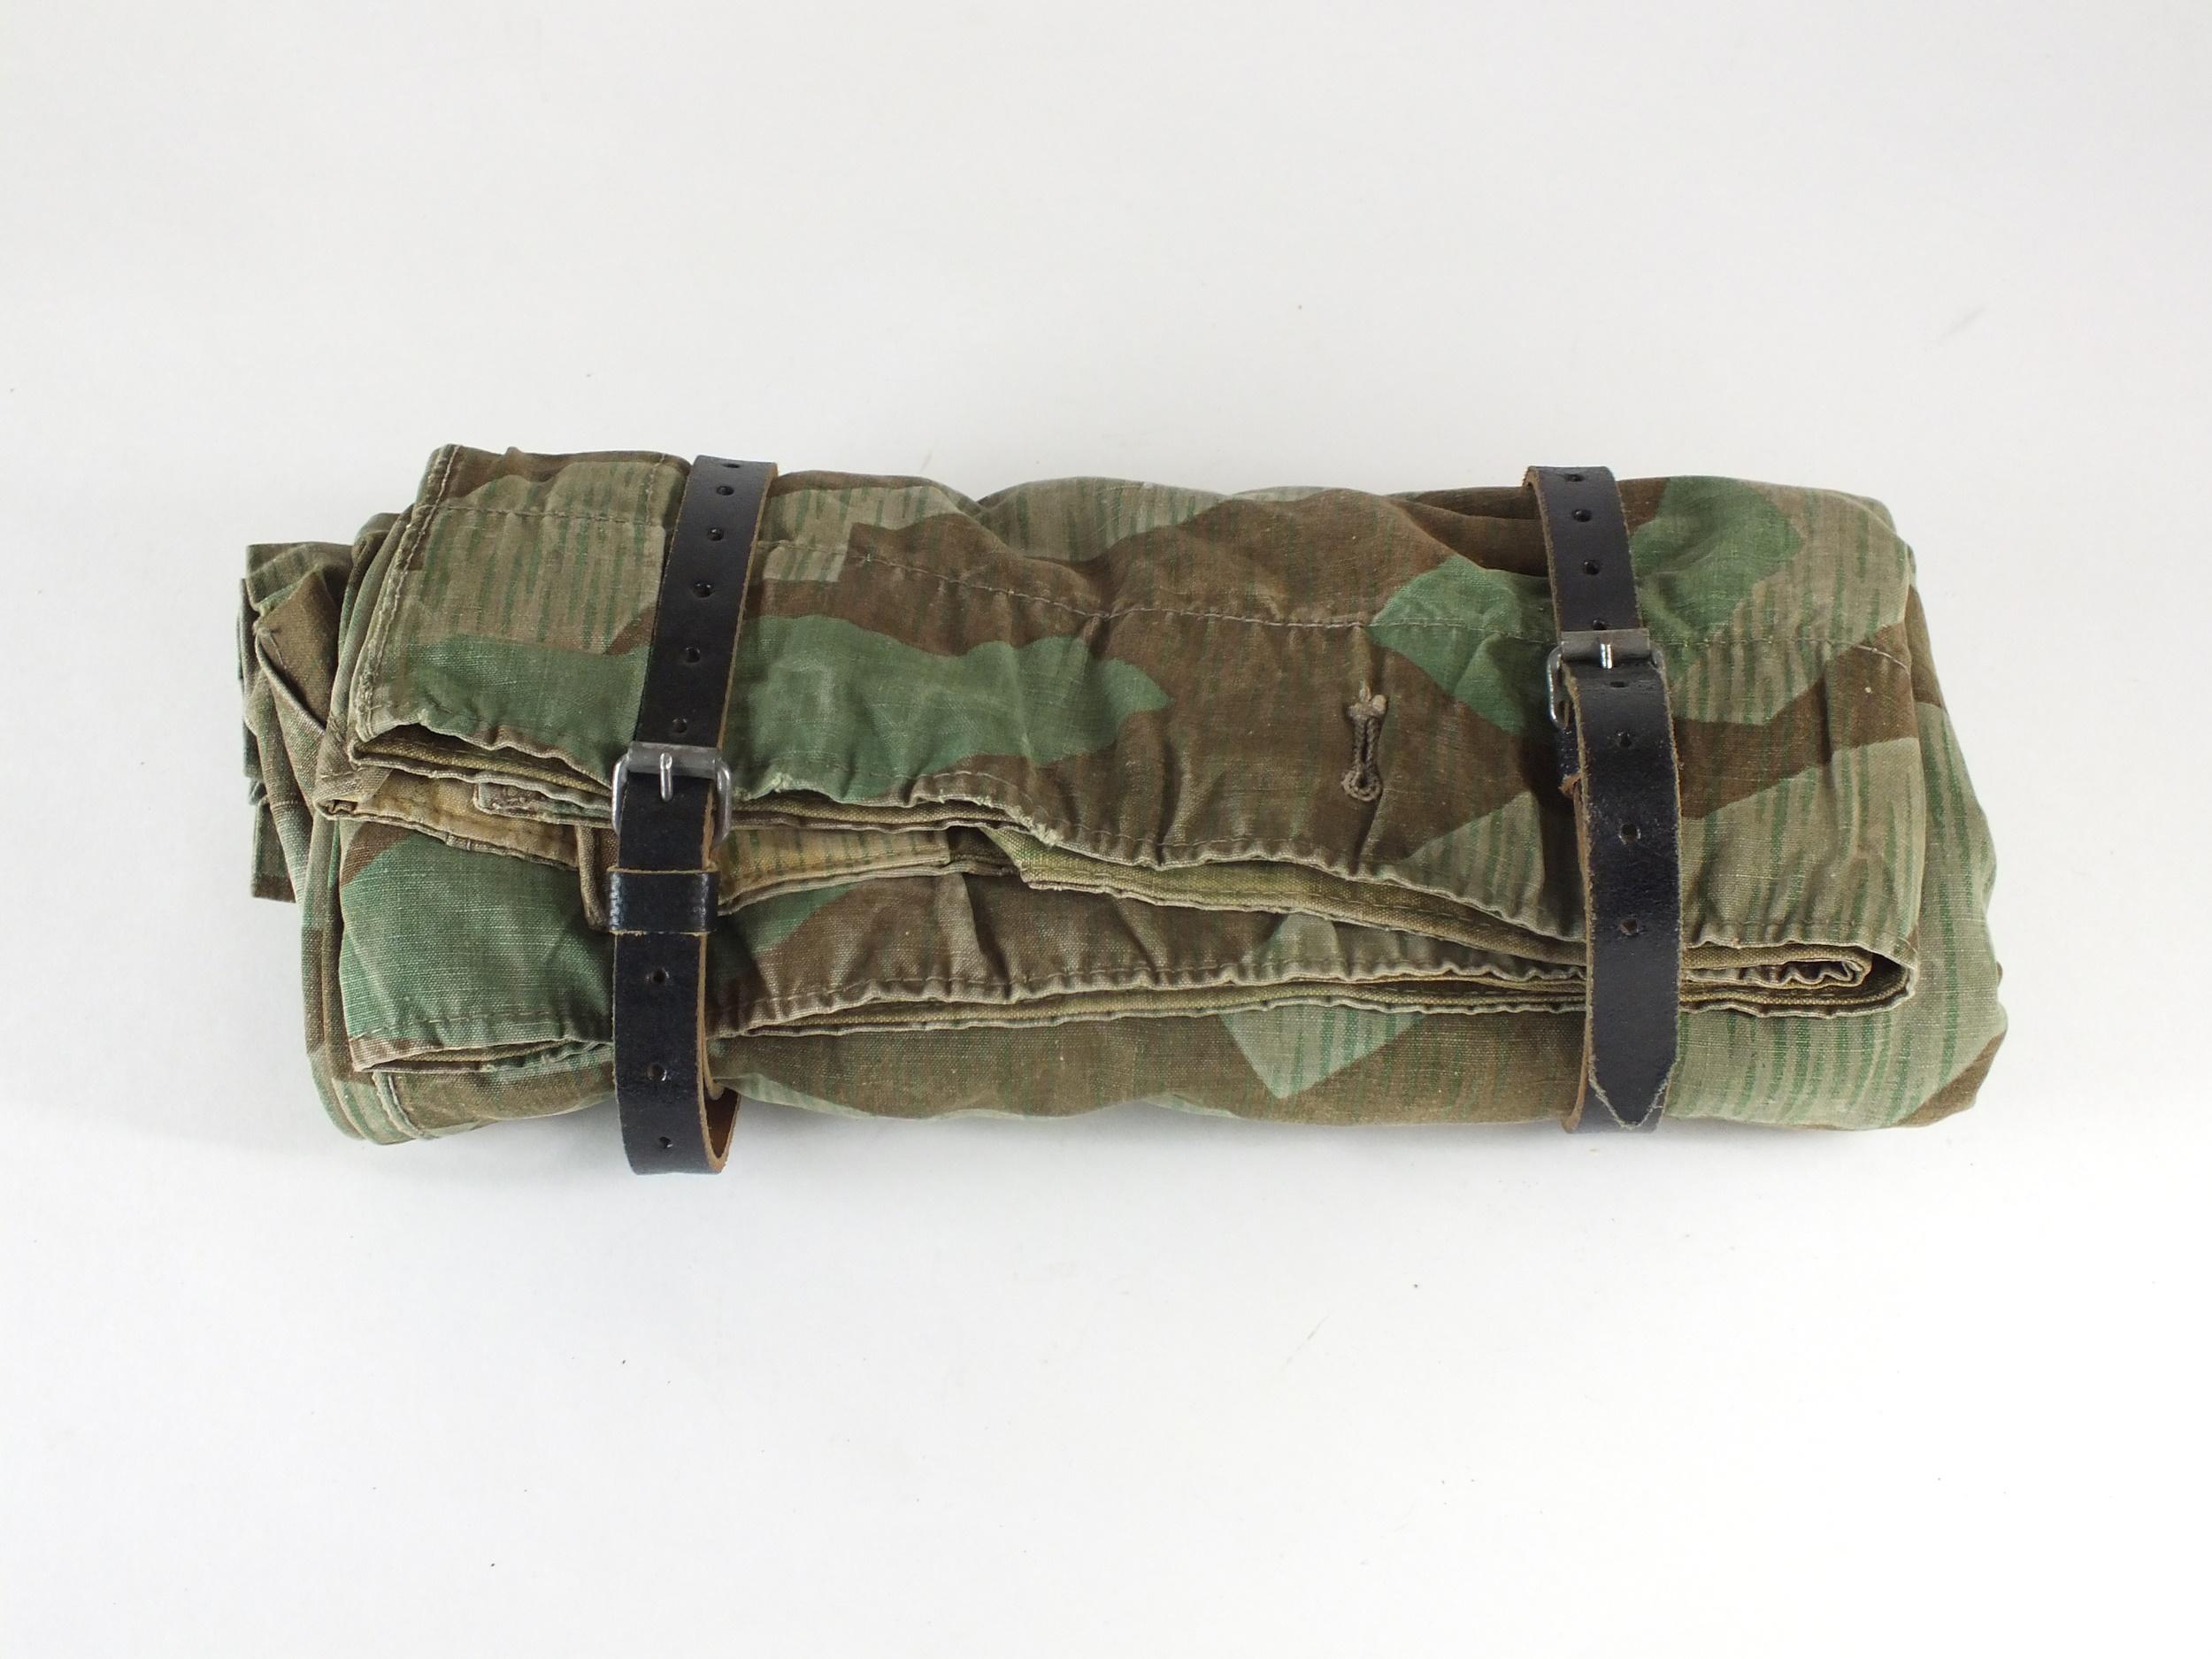 German WW2 camouflage zeltbahn